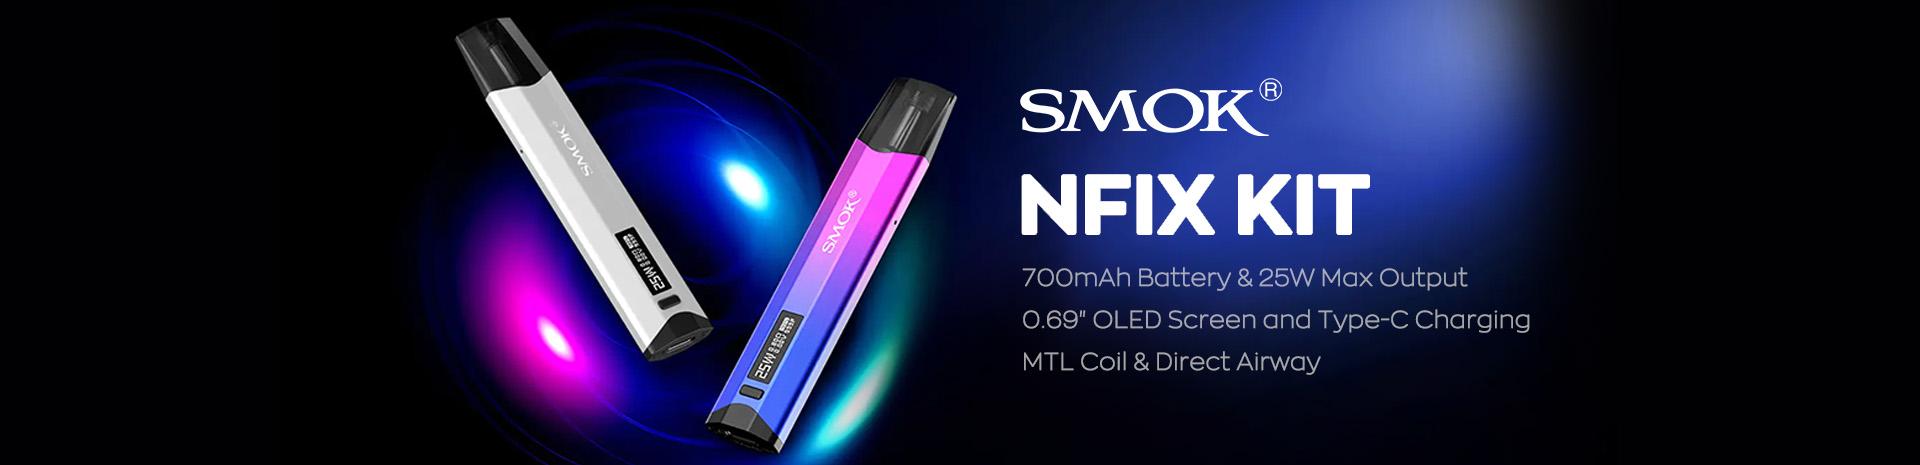 SMOK NFIX Kit Banner